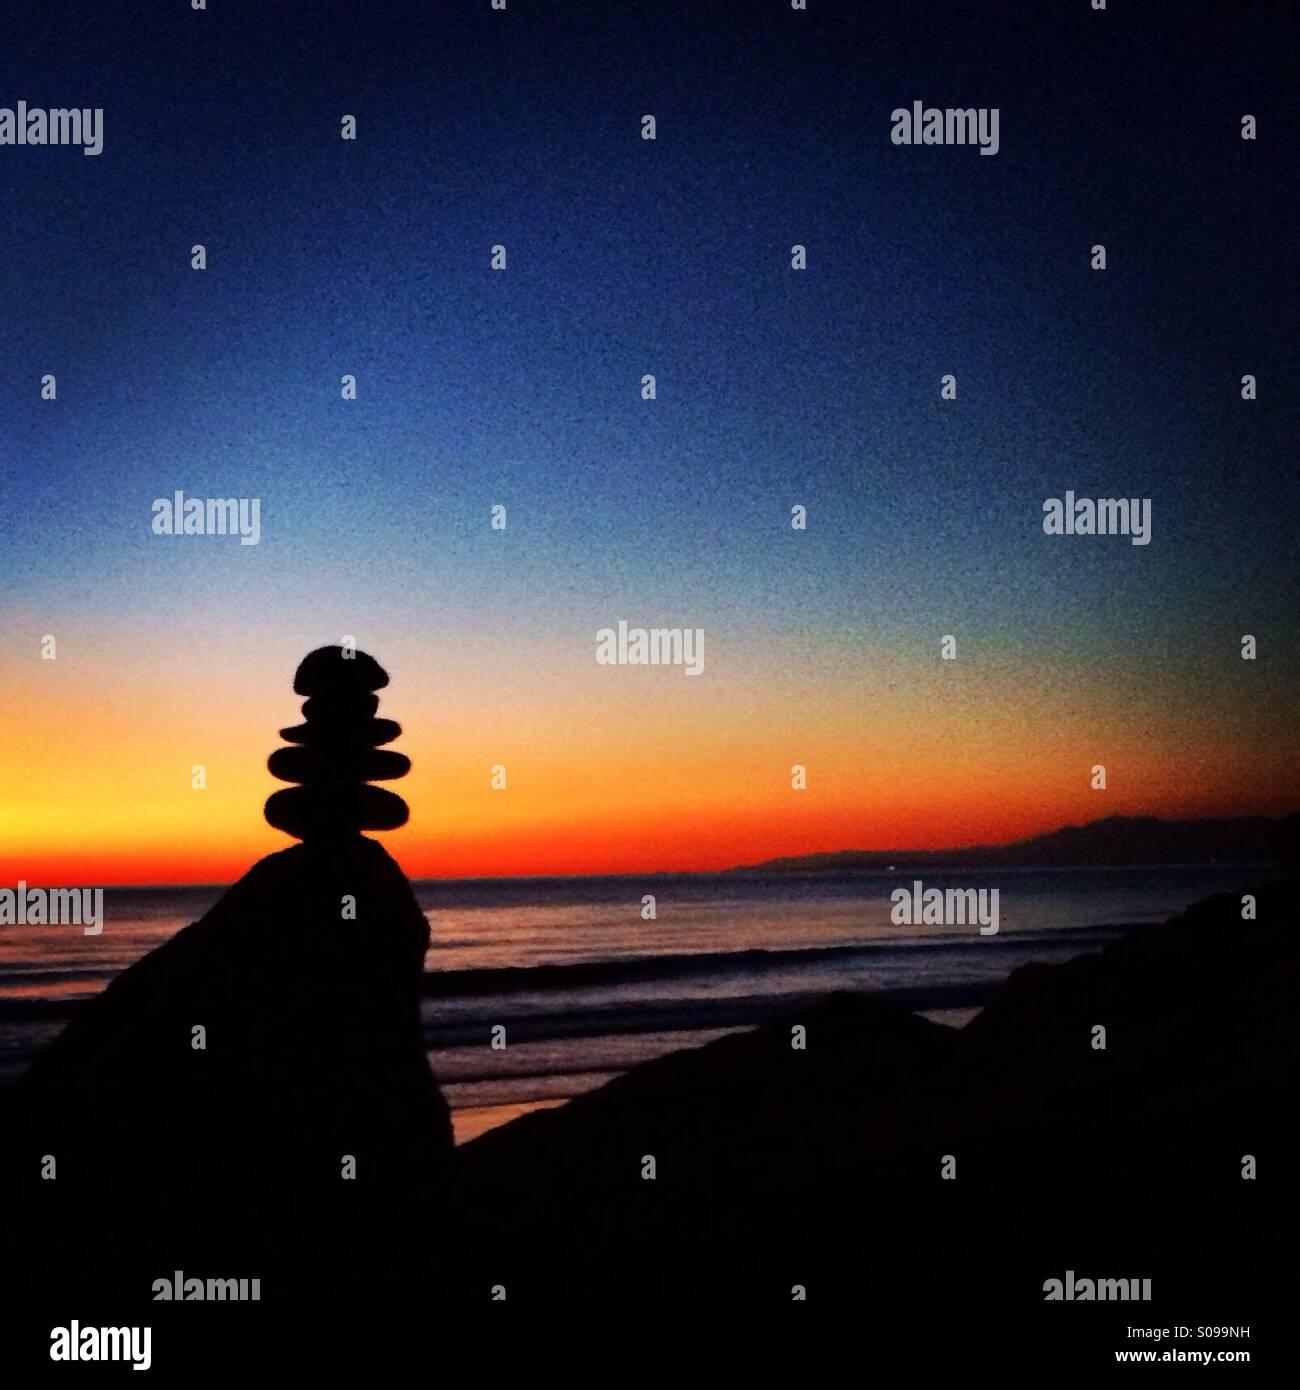 Balance rocks at sunset - Stock Image